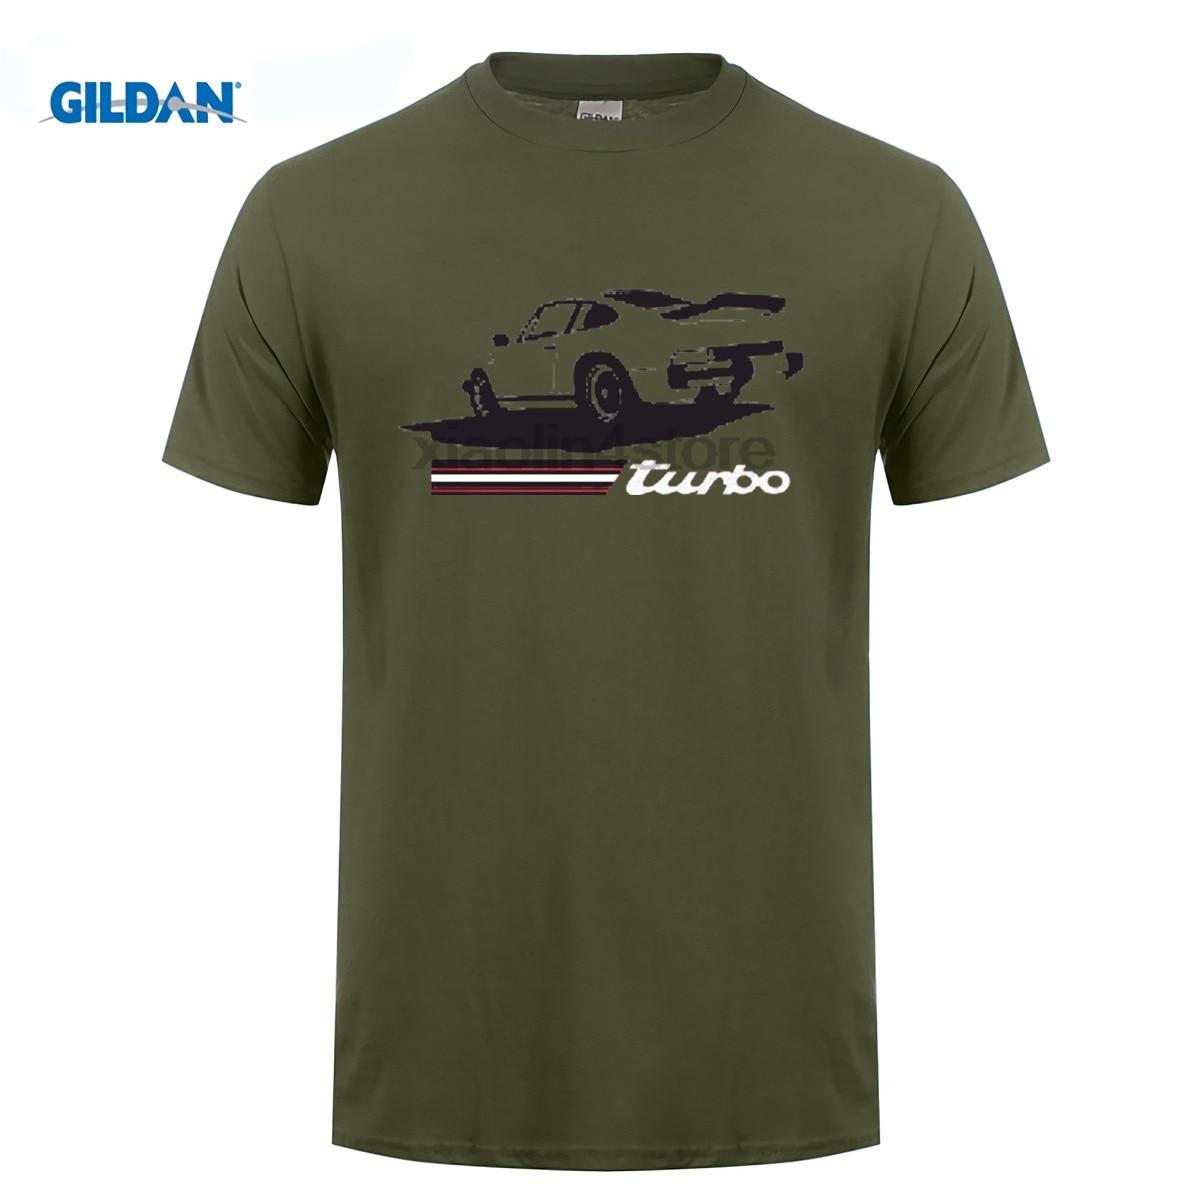 GILDAN DIY style mens t shirts Newest Letter Print Short Sleeve T Shirt Men 911 Turbo Old School Retro Car Cheap T Shirt Design